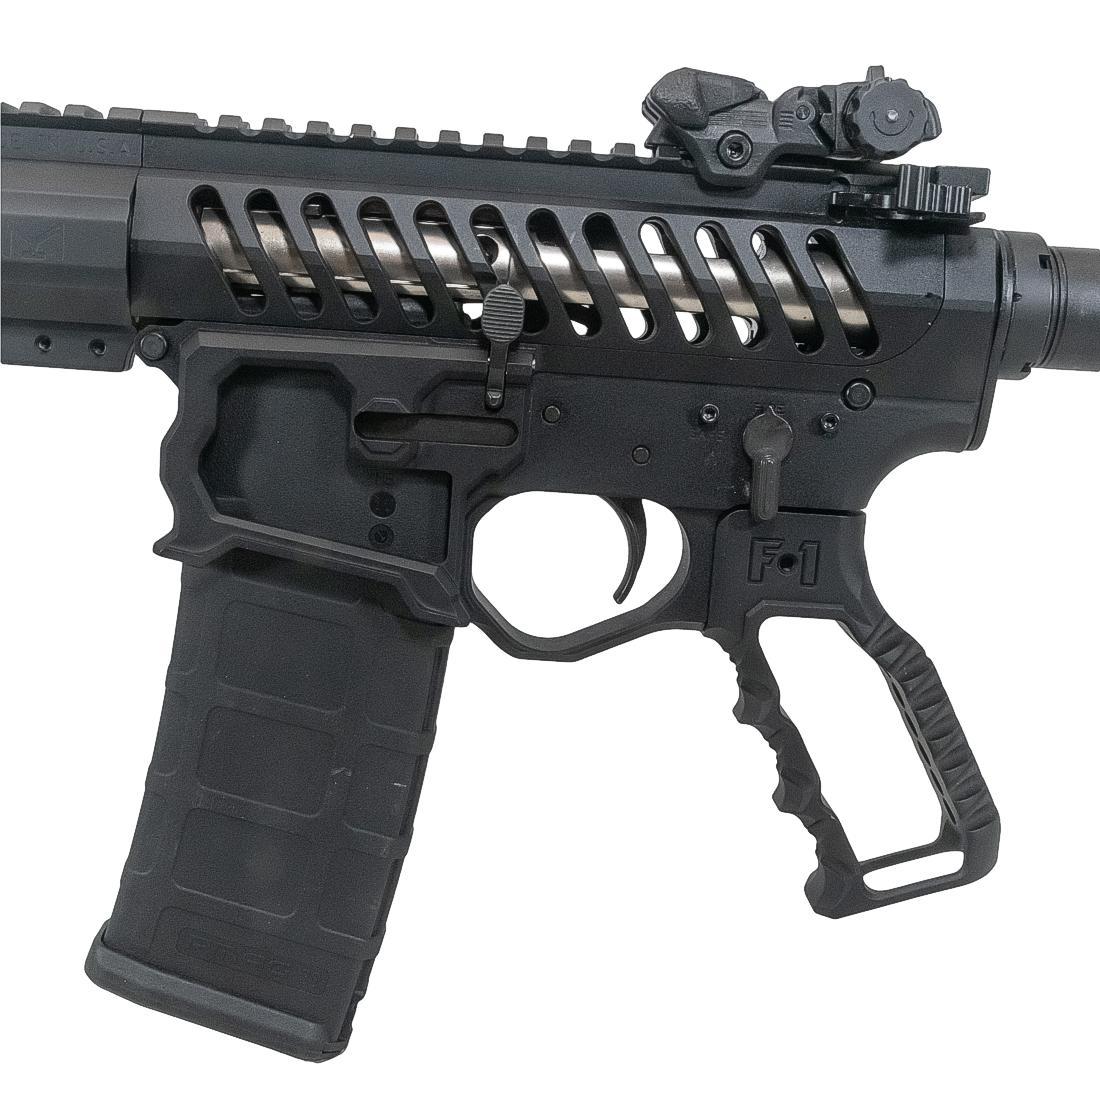 Tss Custom 3g Ar 15 F1 Competition Rifle Black Texas Shooter S Supply